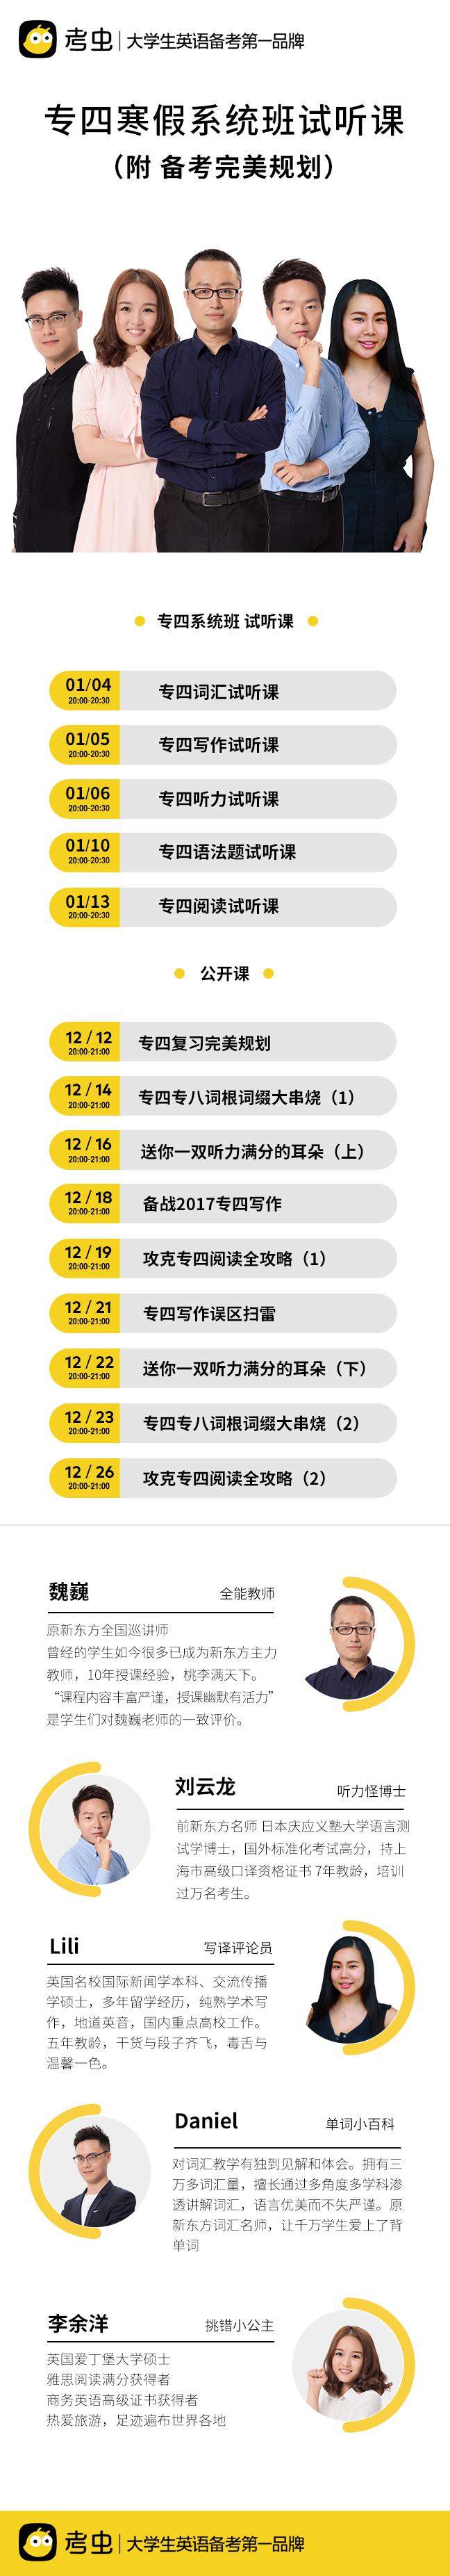 Z4-公开课.png